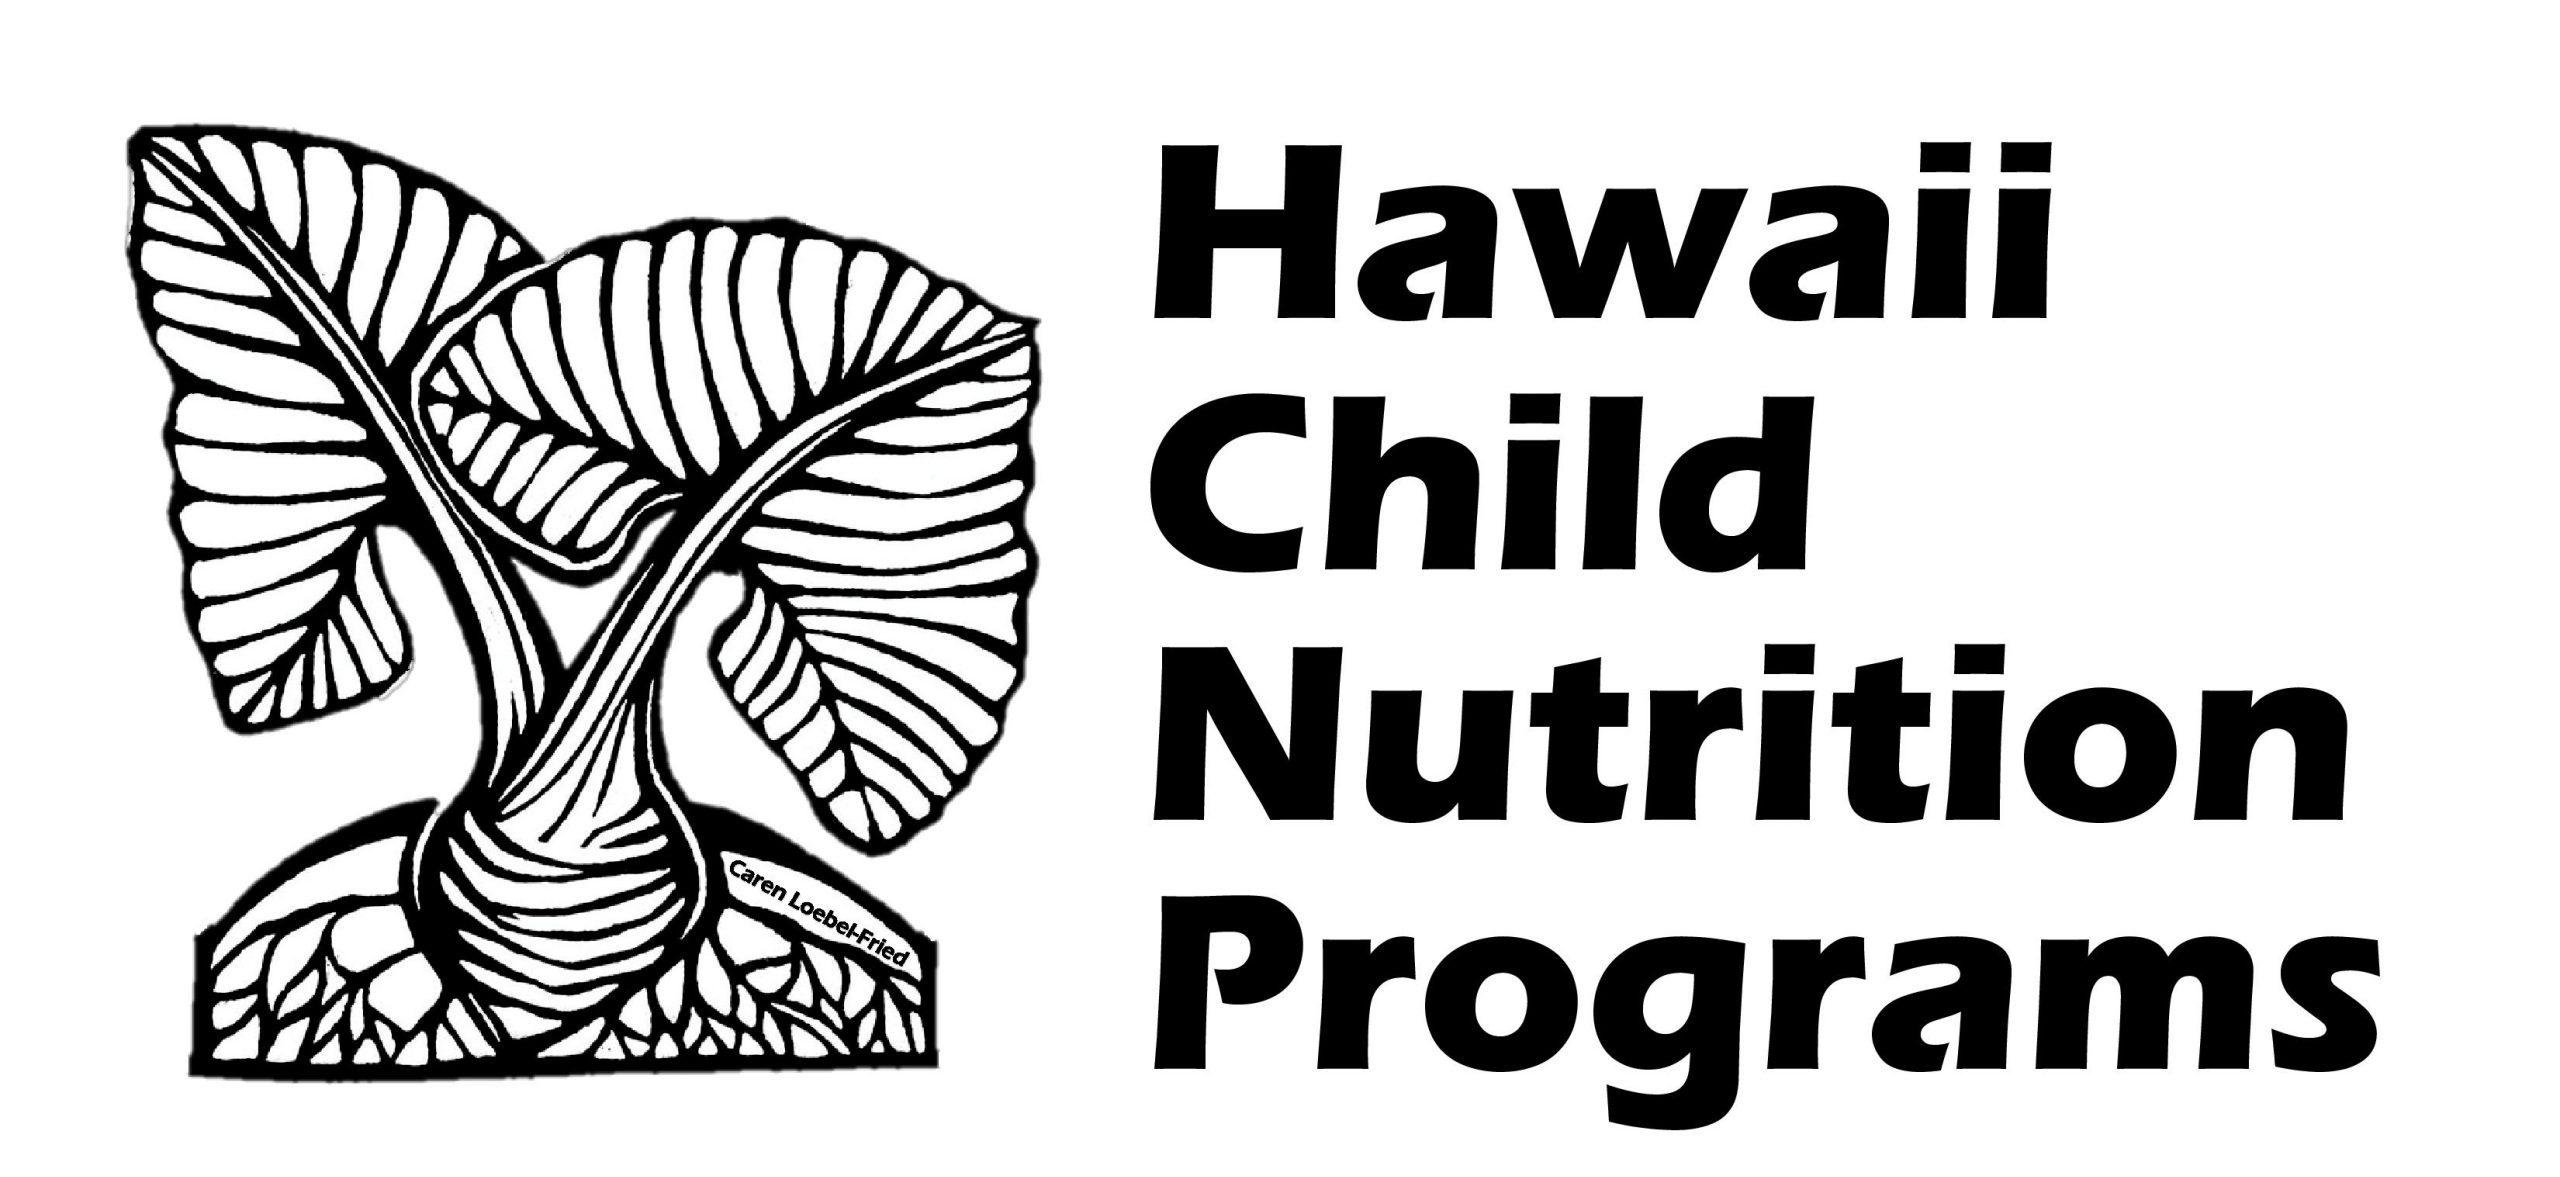 Hawaii Child Nutrition Programs logo